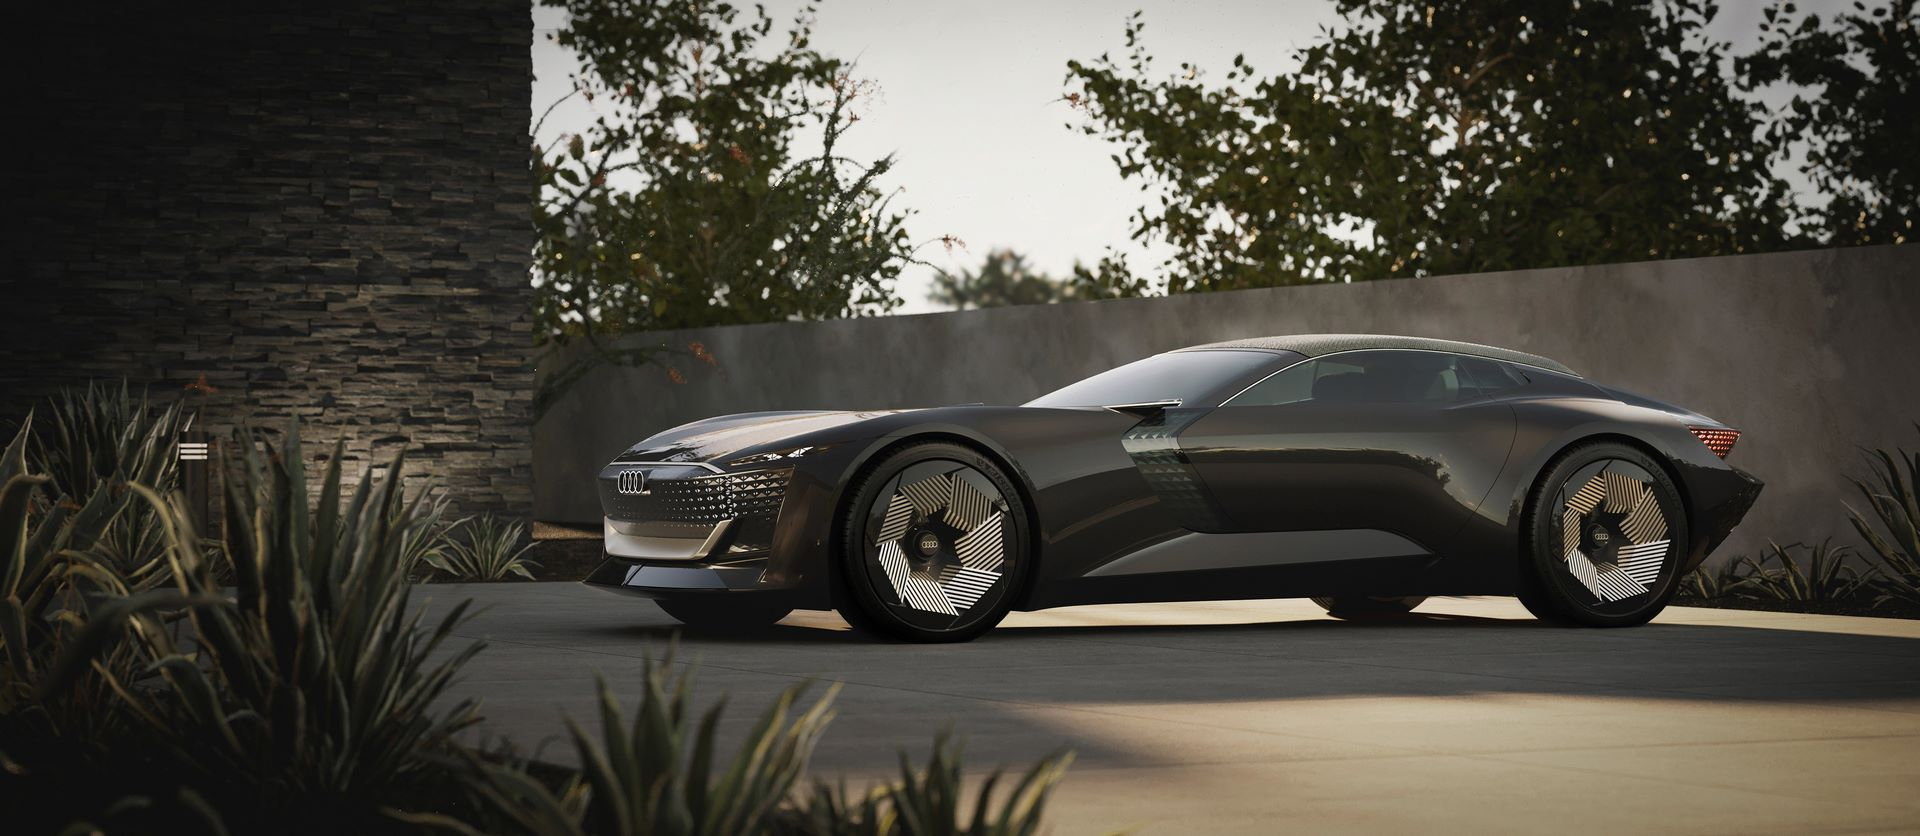 Audi-Skysphere-Concept-27